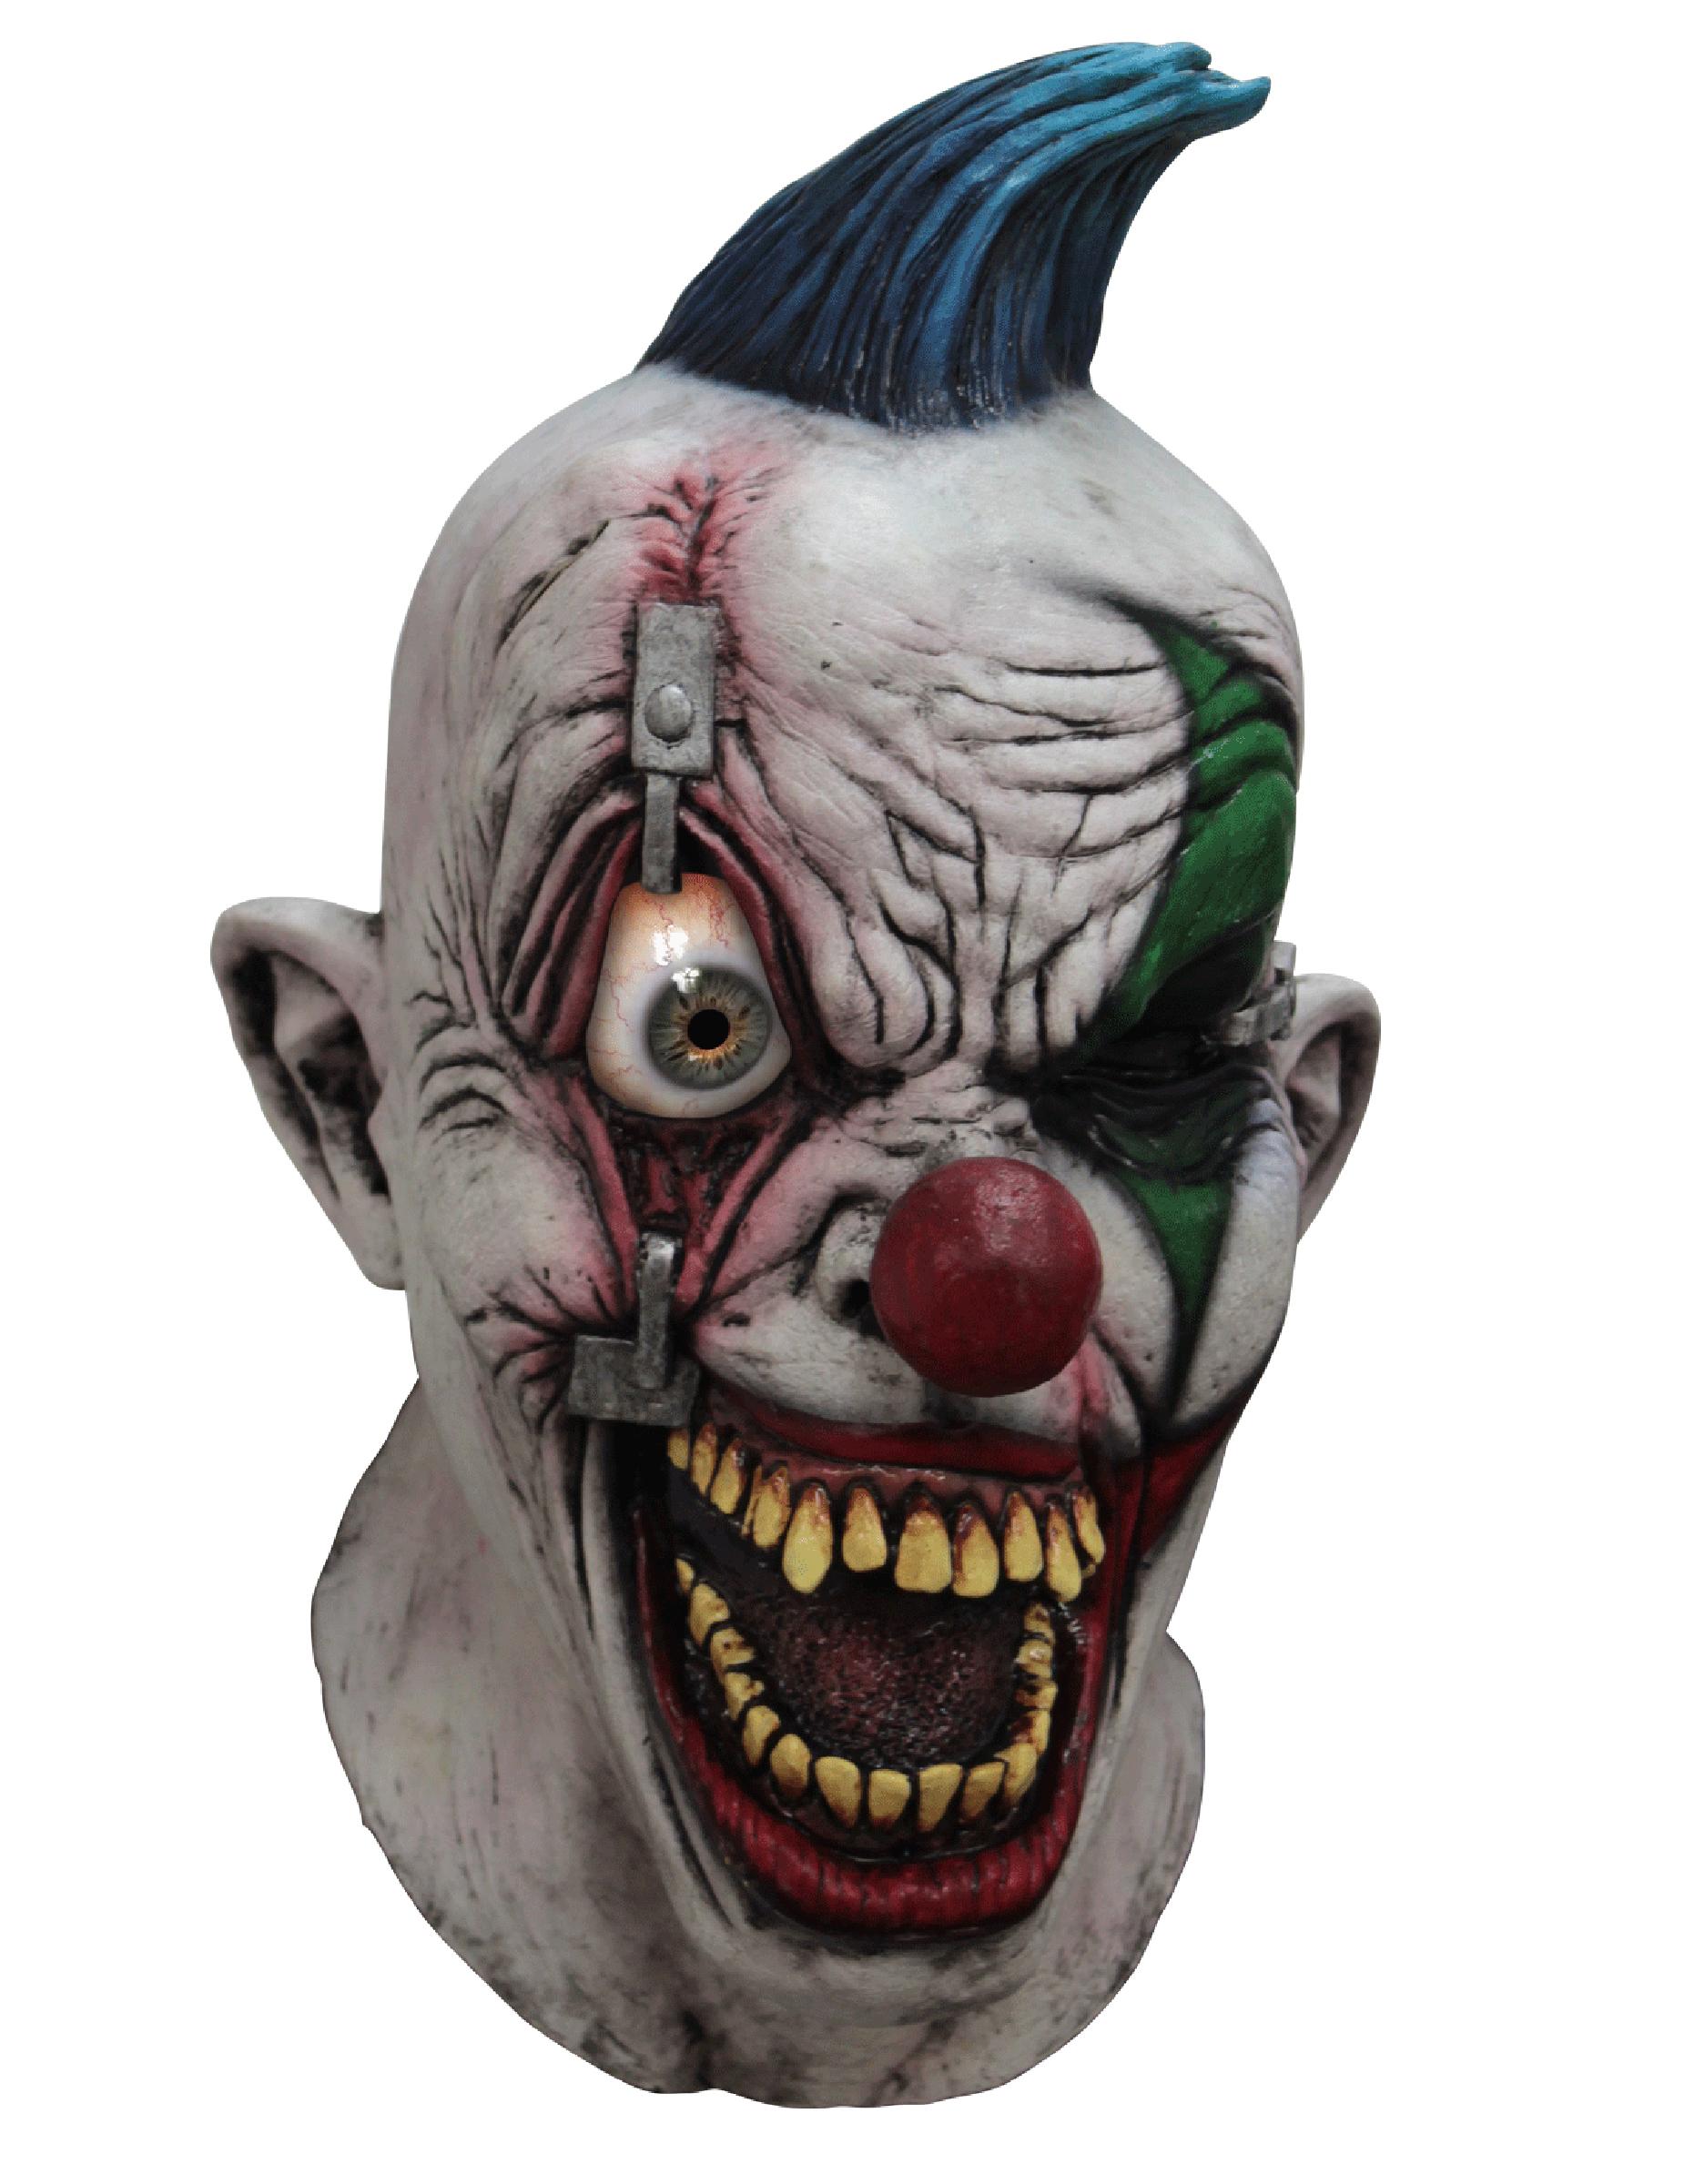 Halloween Maschere.Maschera Integrale Da Clown Agghiacciante Halloween